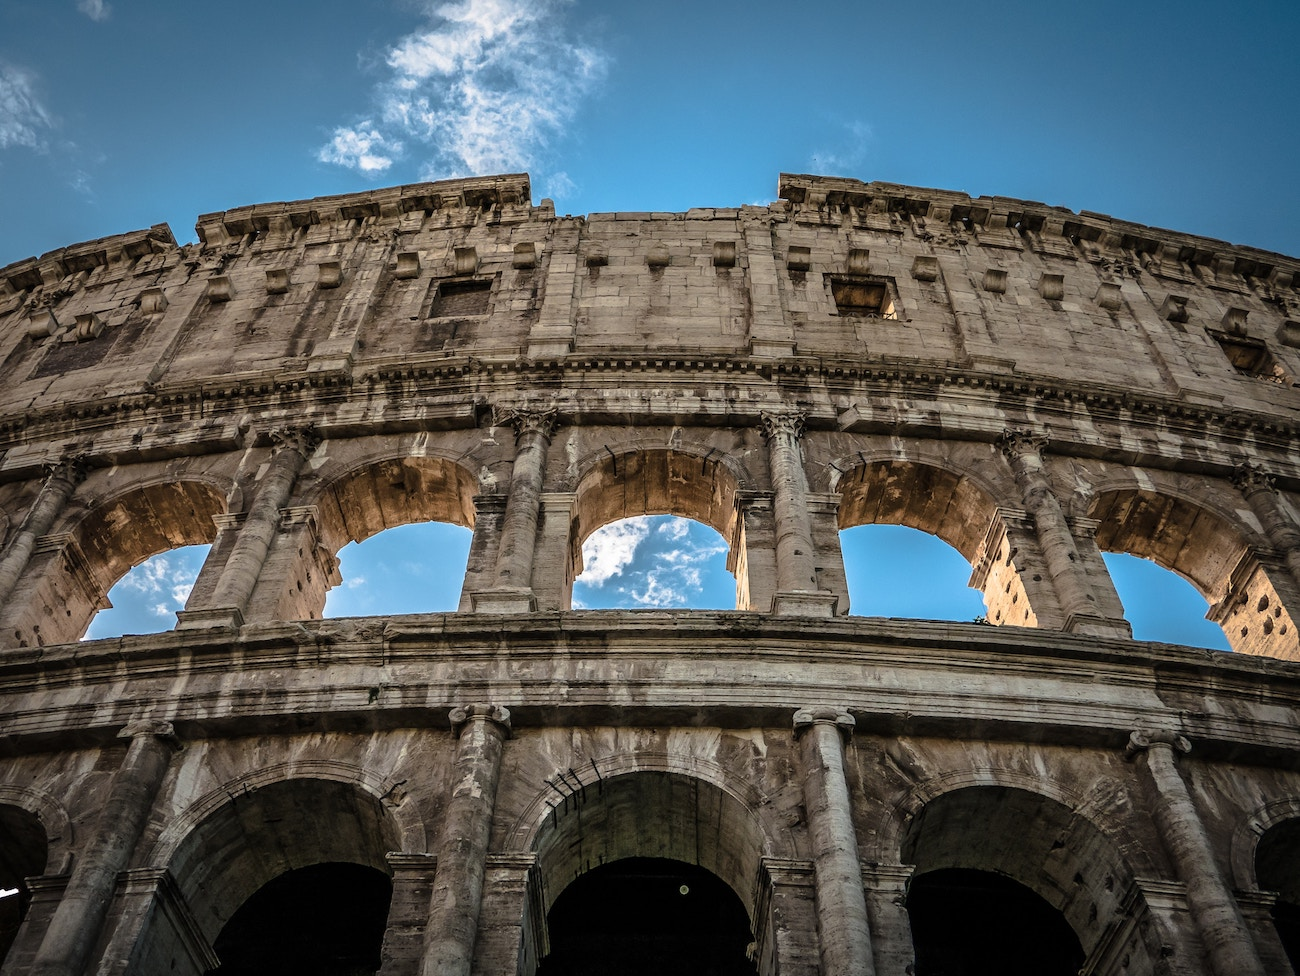 Colosseum in Roma by @macphoto via Unsplash